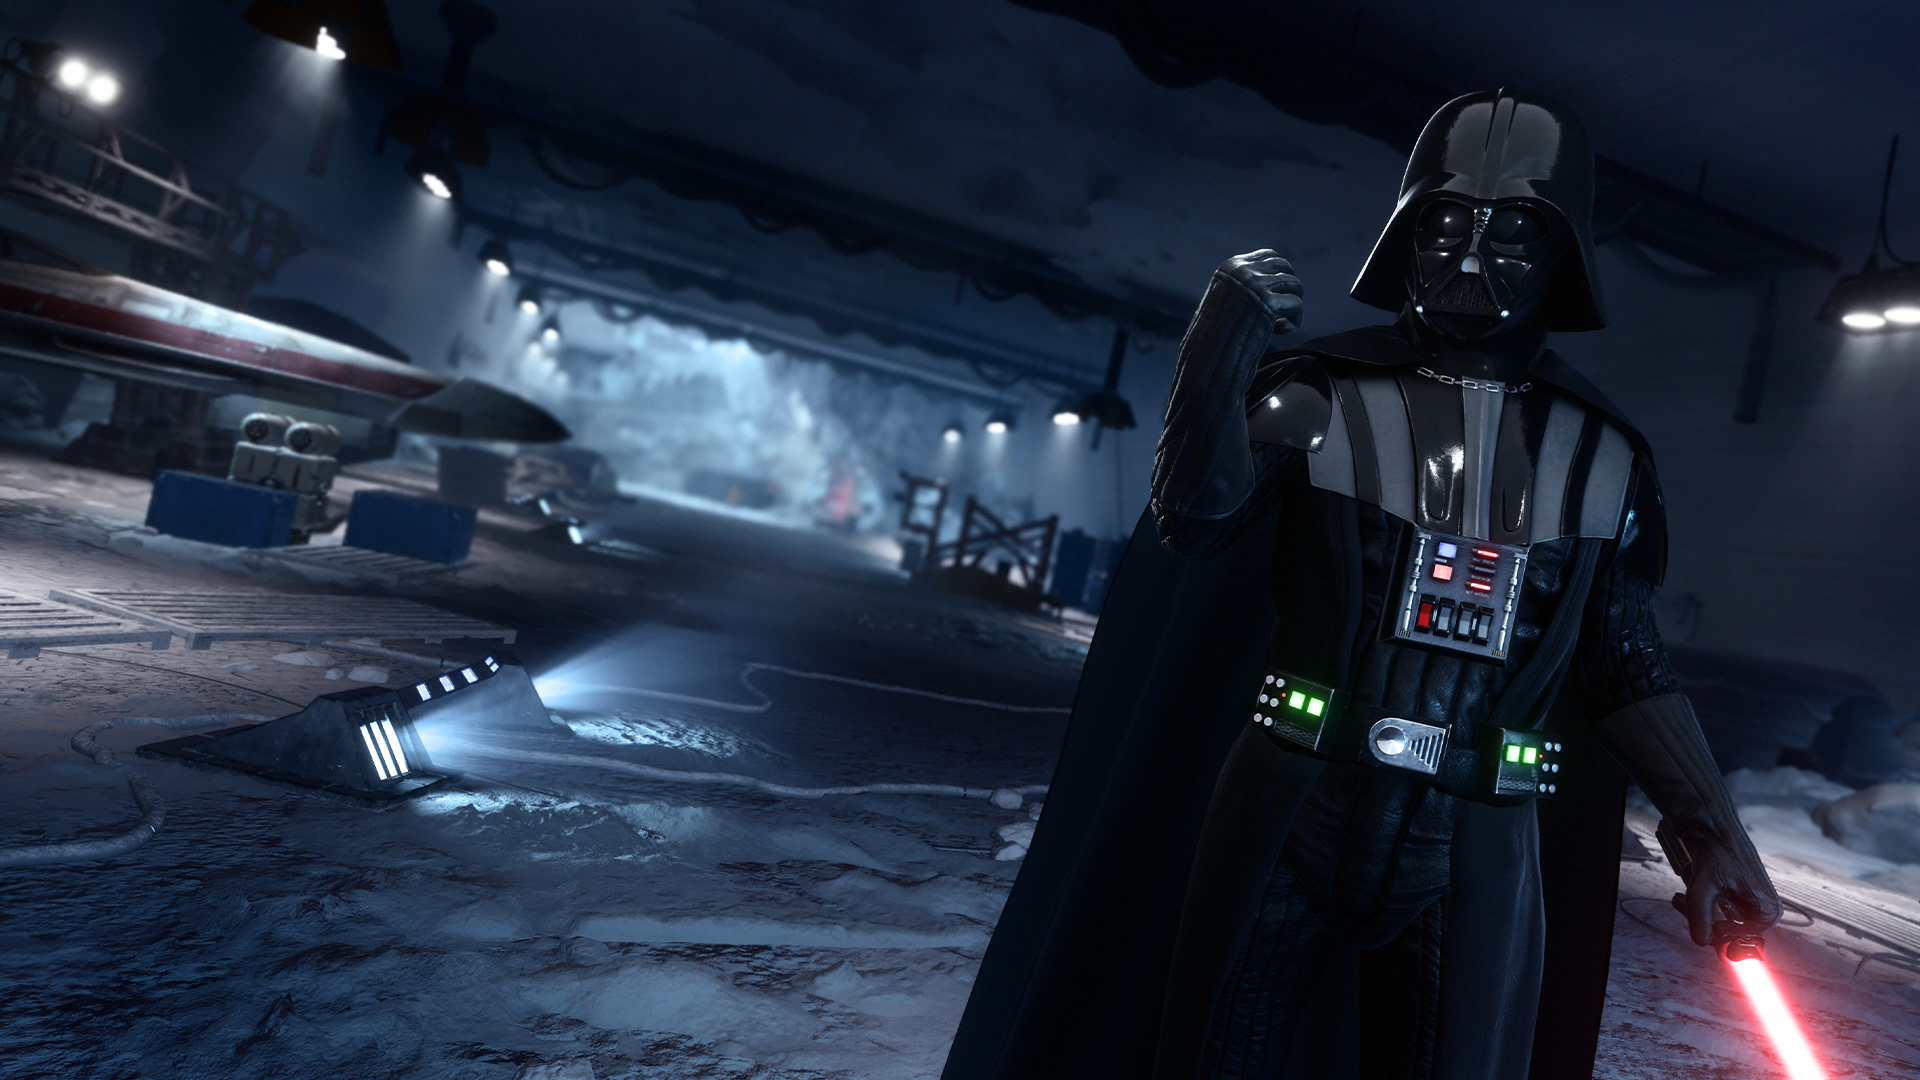 Star Wars Battlefront The Dark Side Wallpaper By Faithfullfaun1 On Deviantart